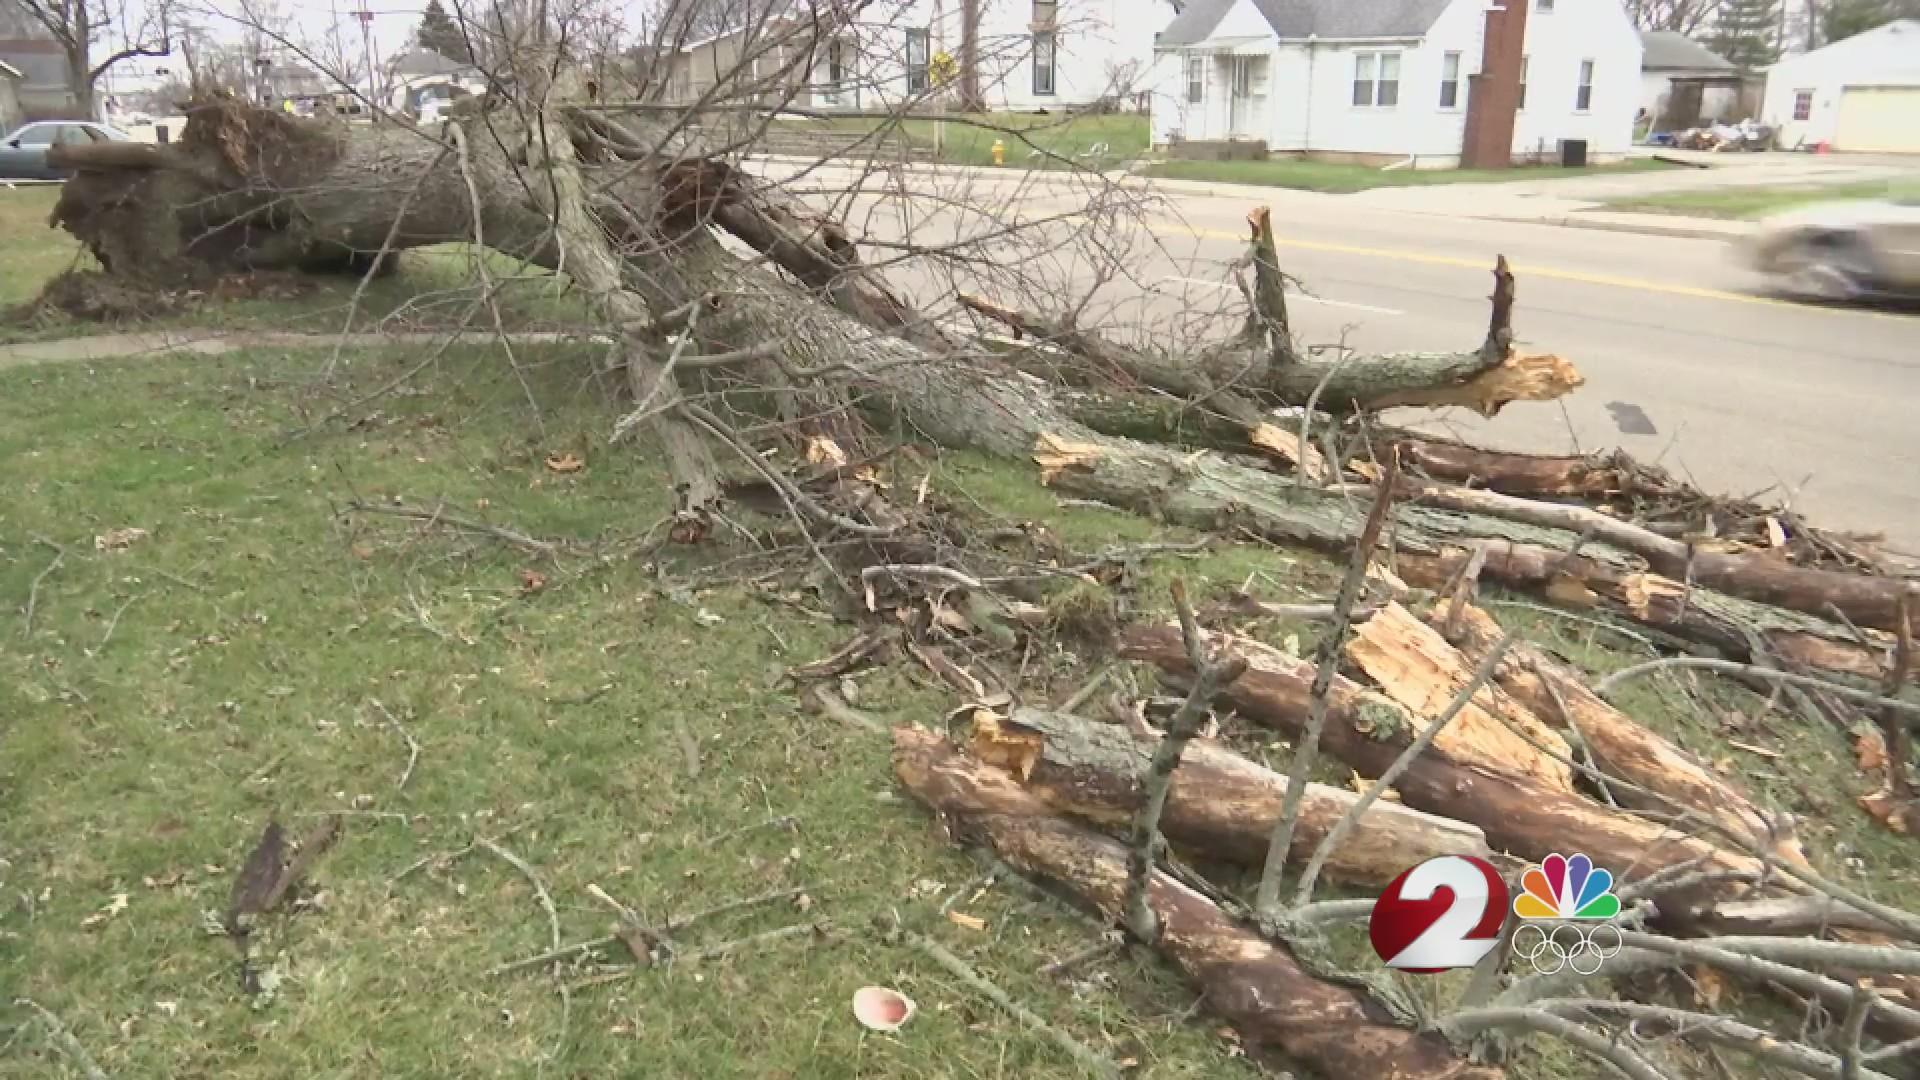 Tornado cleanup efforts